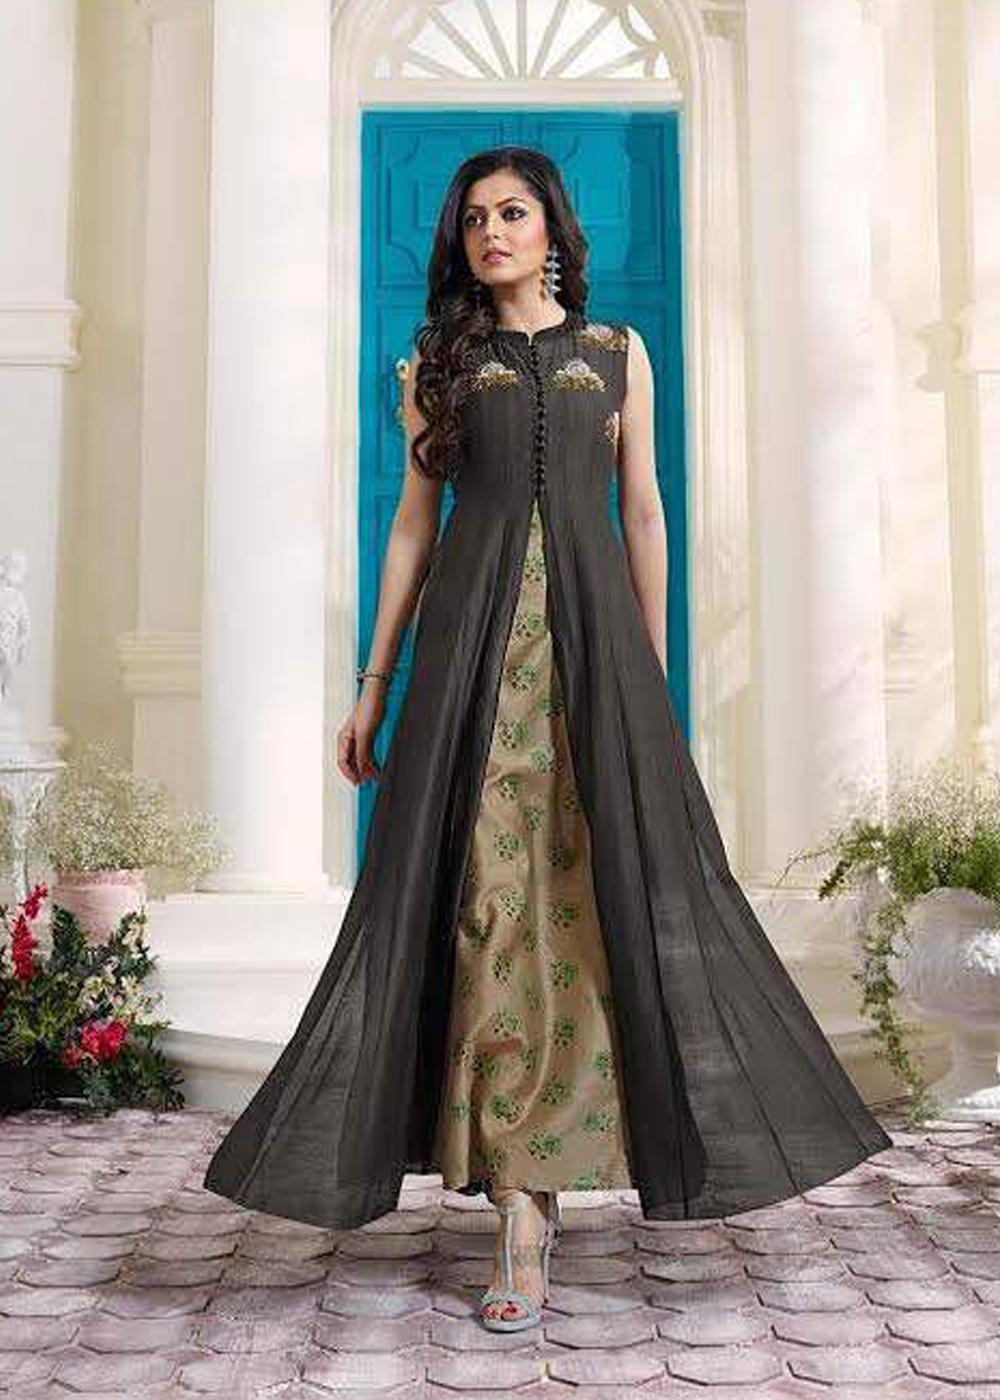 007f663f1c Prescious black and Beige Designer Drshti Dhami Anarkali Salwar kameez.  Abaya Fashion, India Fashion, Ethnic Fashion, Style Fashion, Ethnic Trends,  Recycled